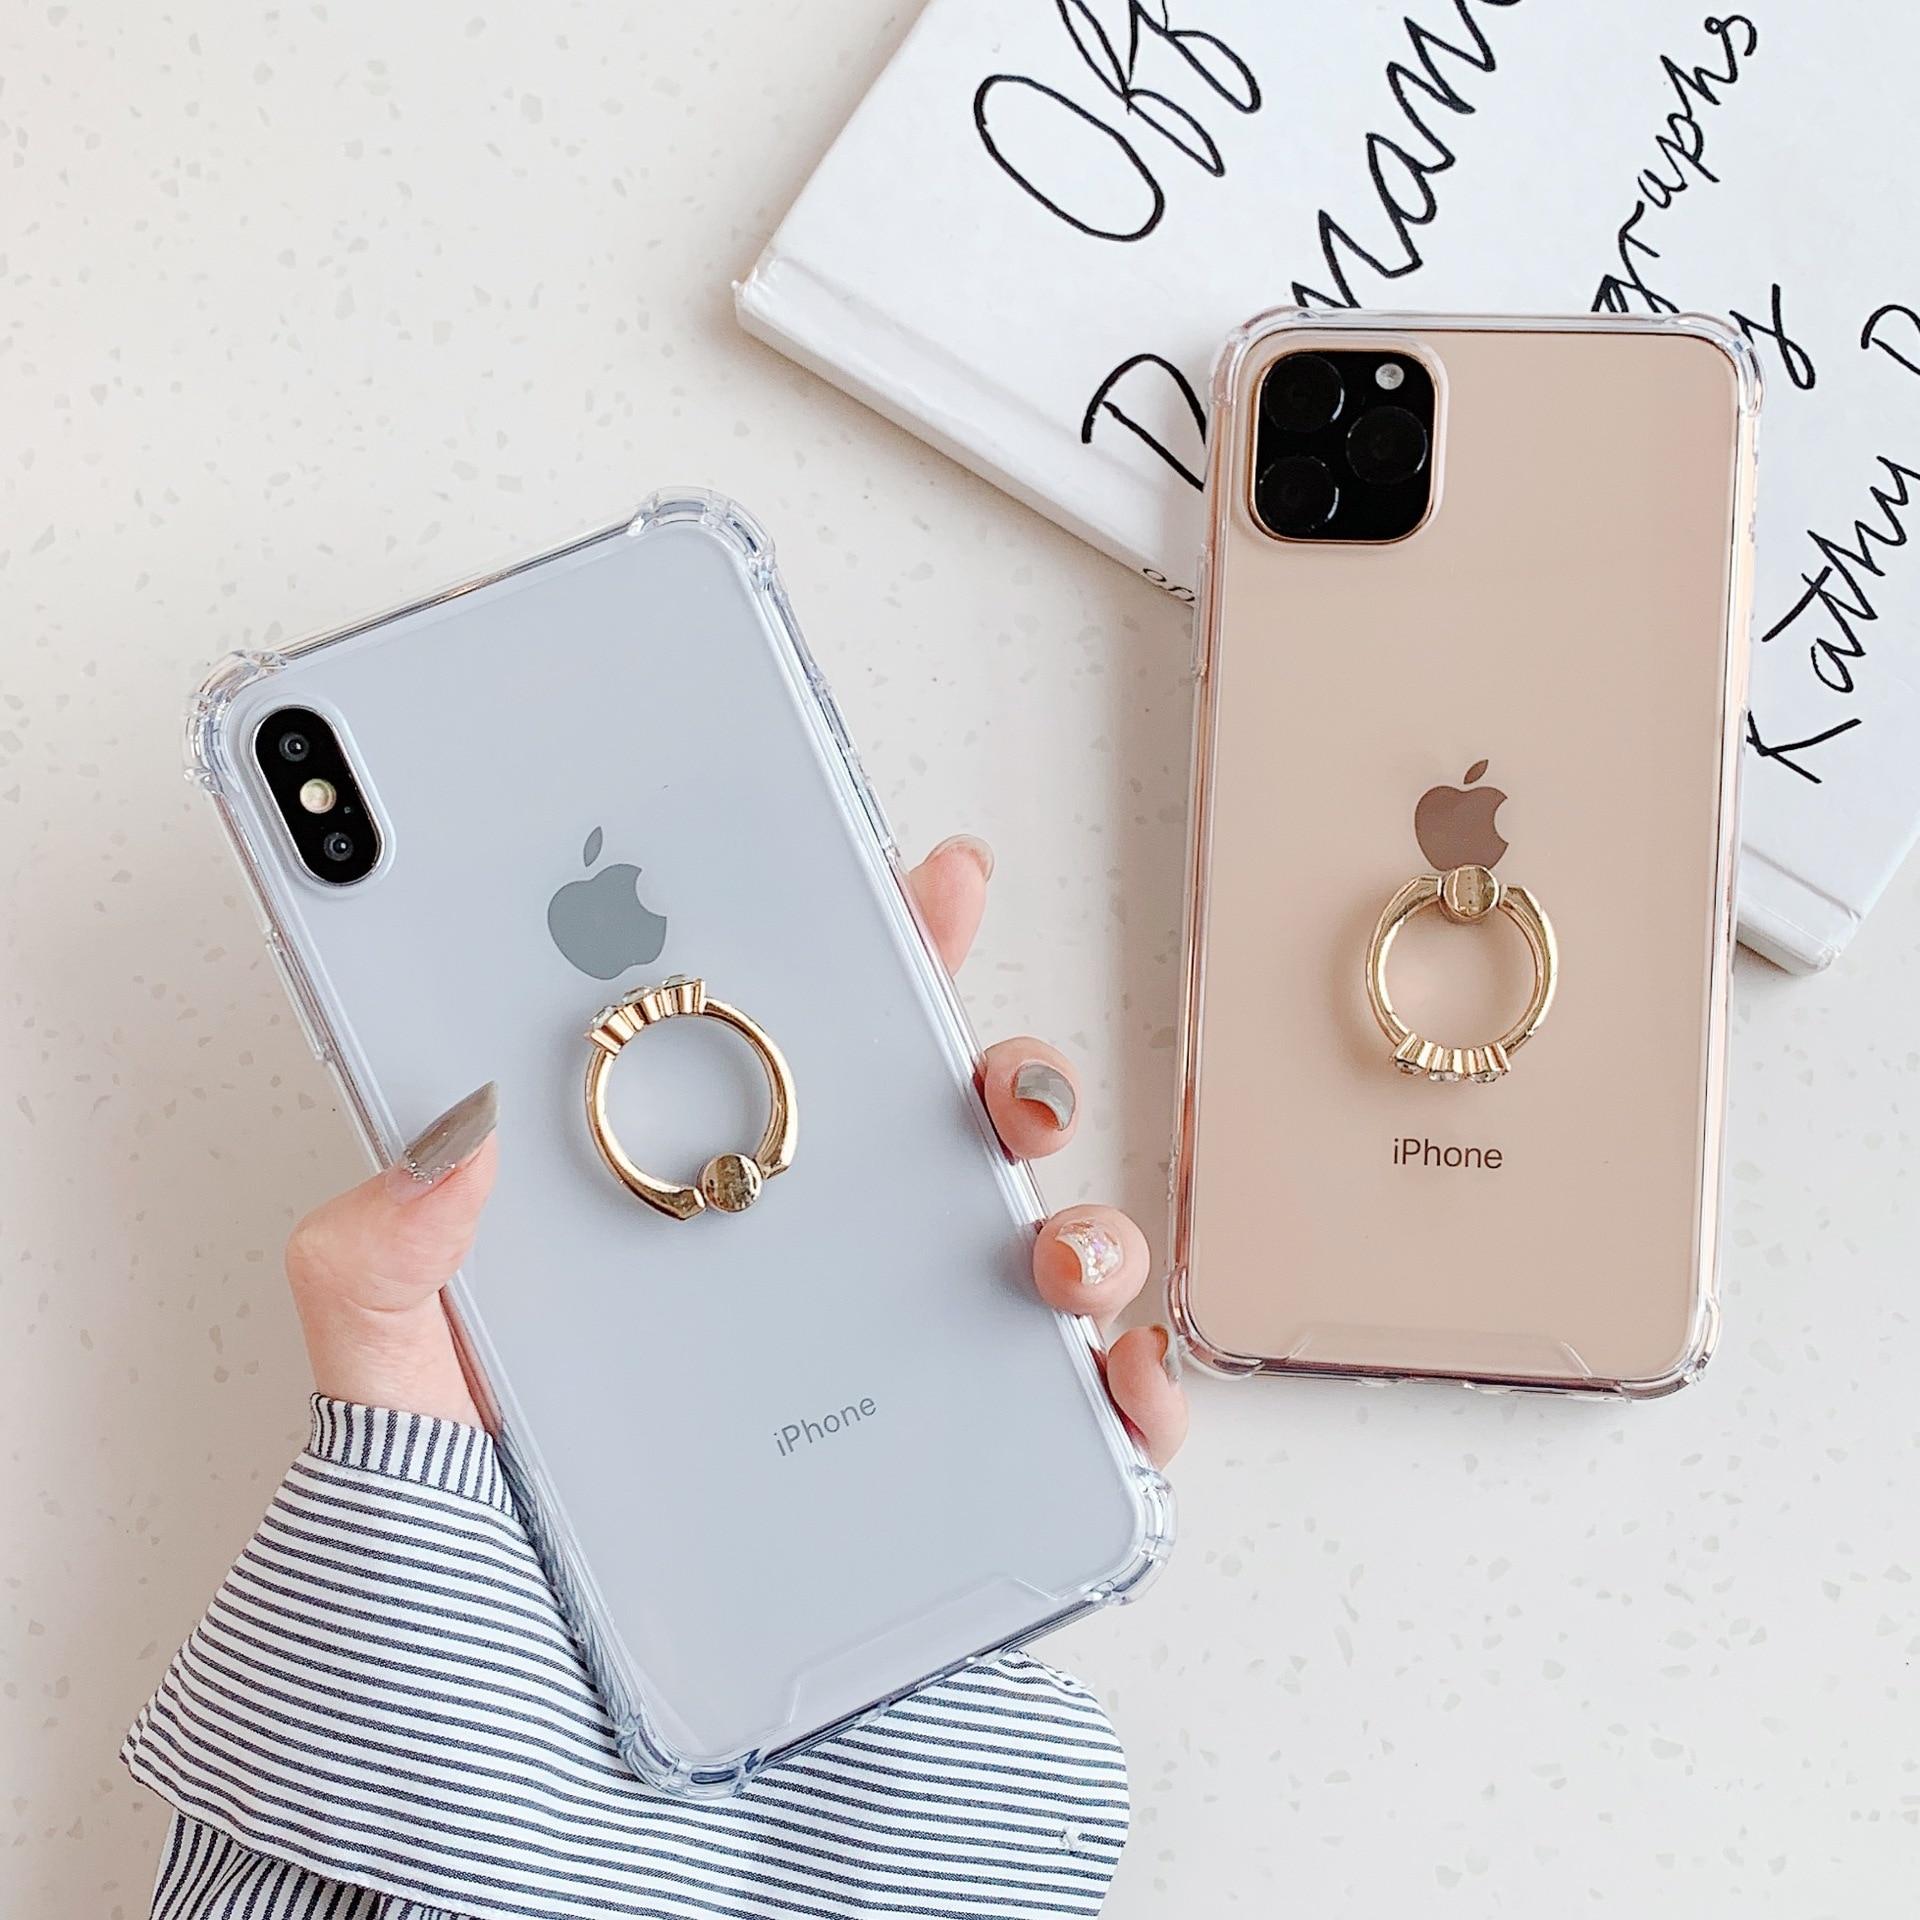 Luxus Transparent Für iPhone 11 Fall 11 Pro Max XR X XS Max 8 7 Plus Fall Gold Finger Ring klar Zurück Abdeckung Fundas Coque